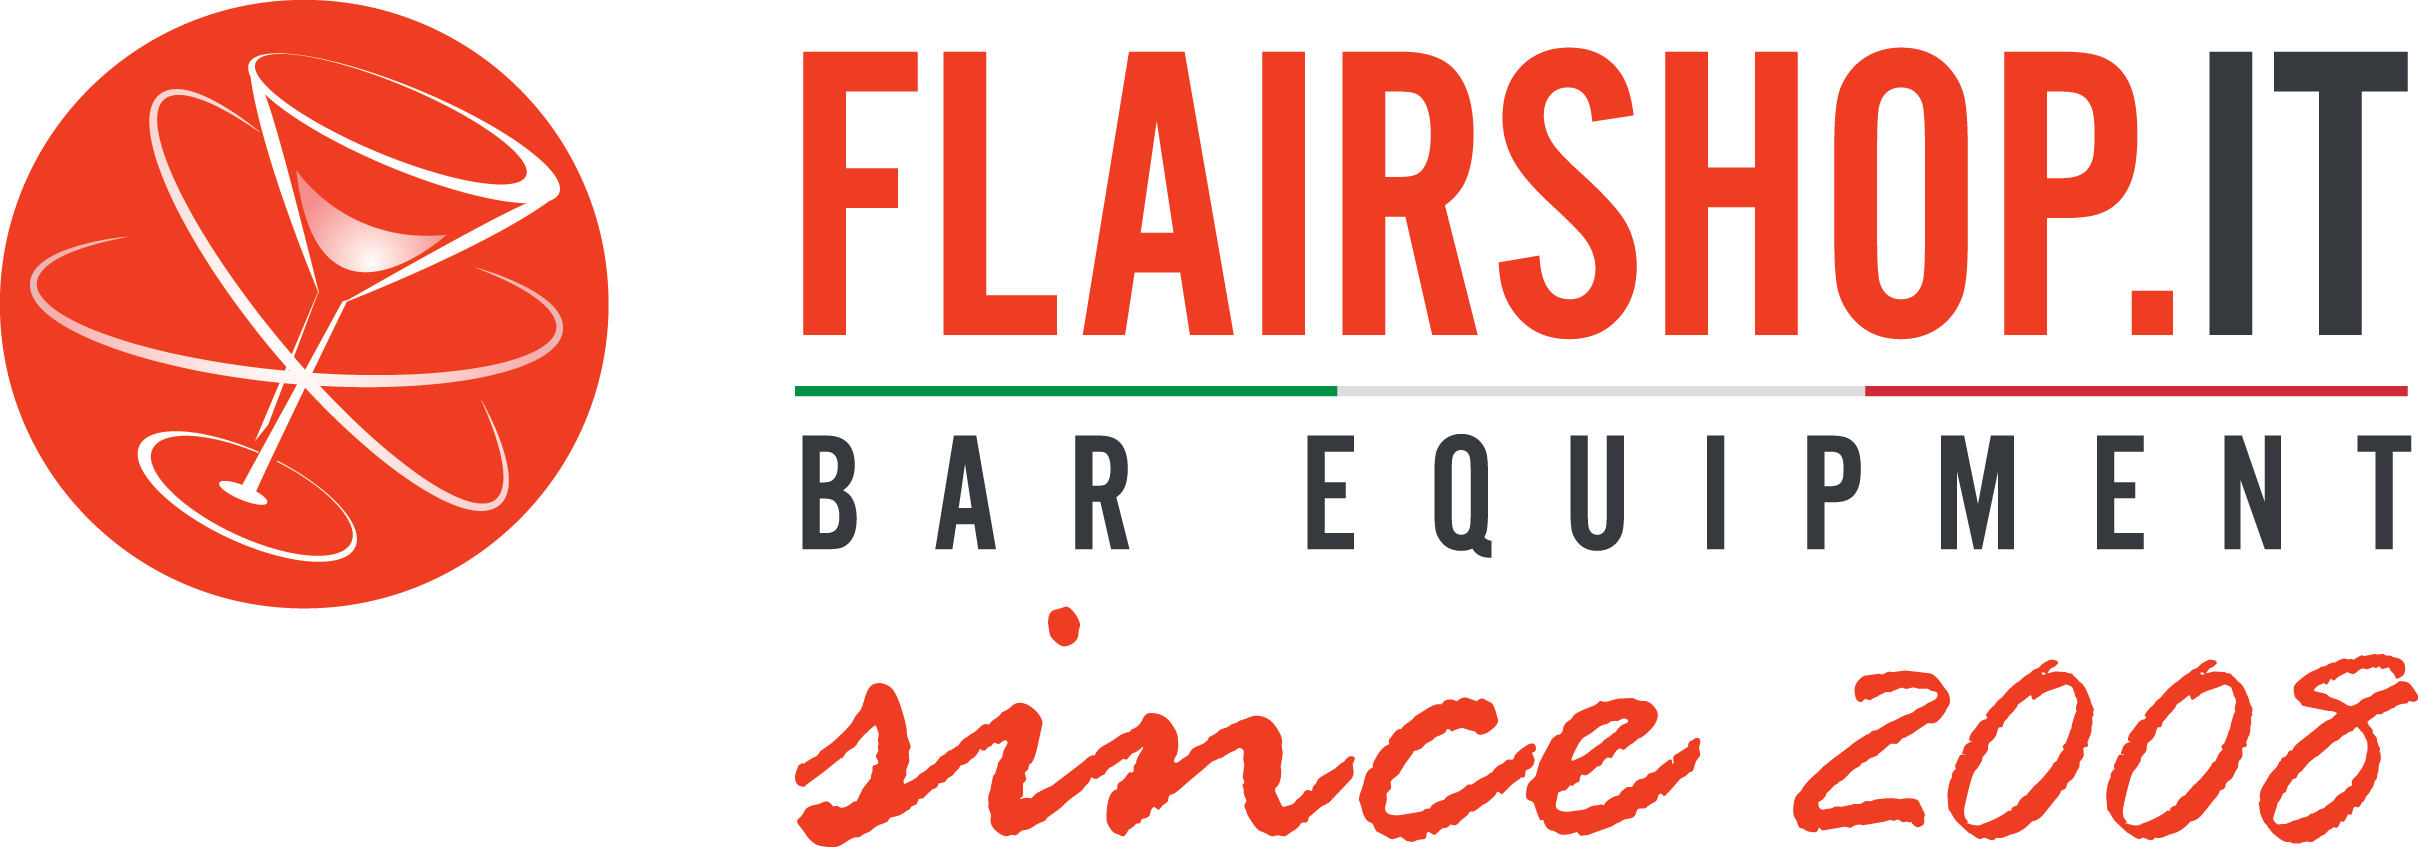 flairshop